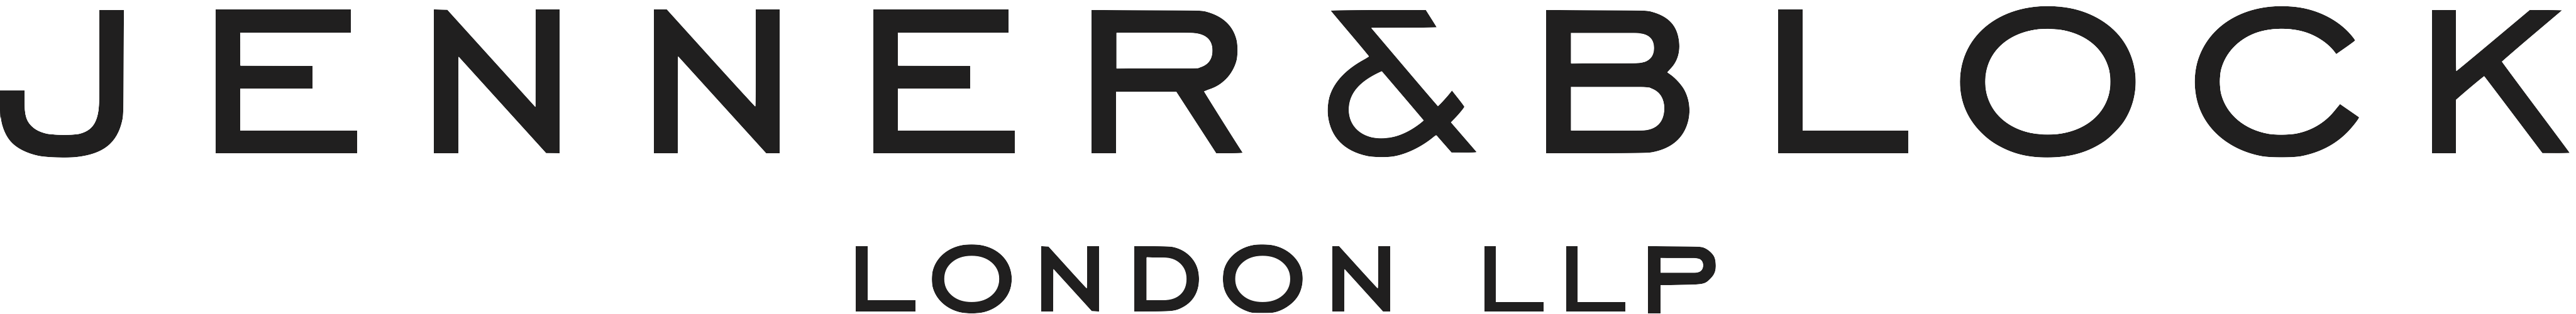 J&B logo masterBlack LLP London Centered